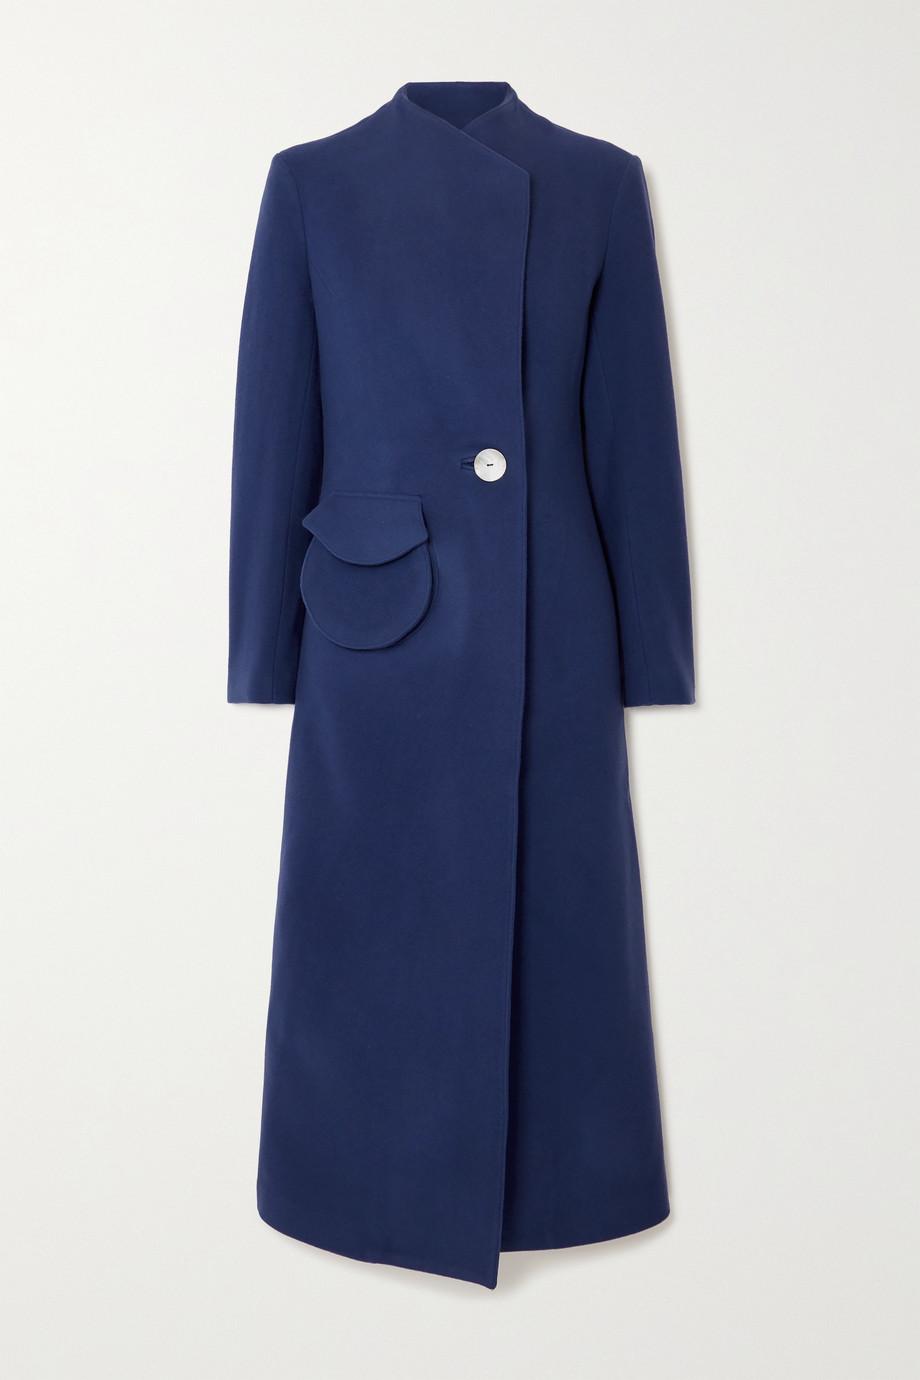 USISI SISTER Natasha wool-felt coat